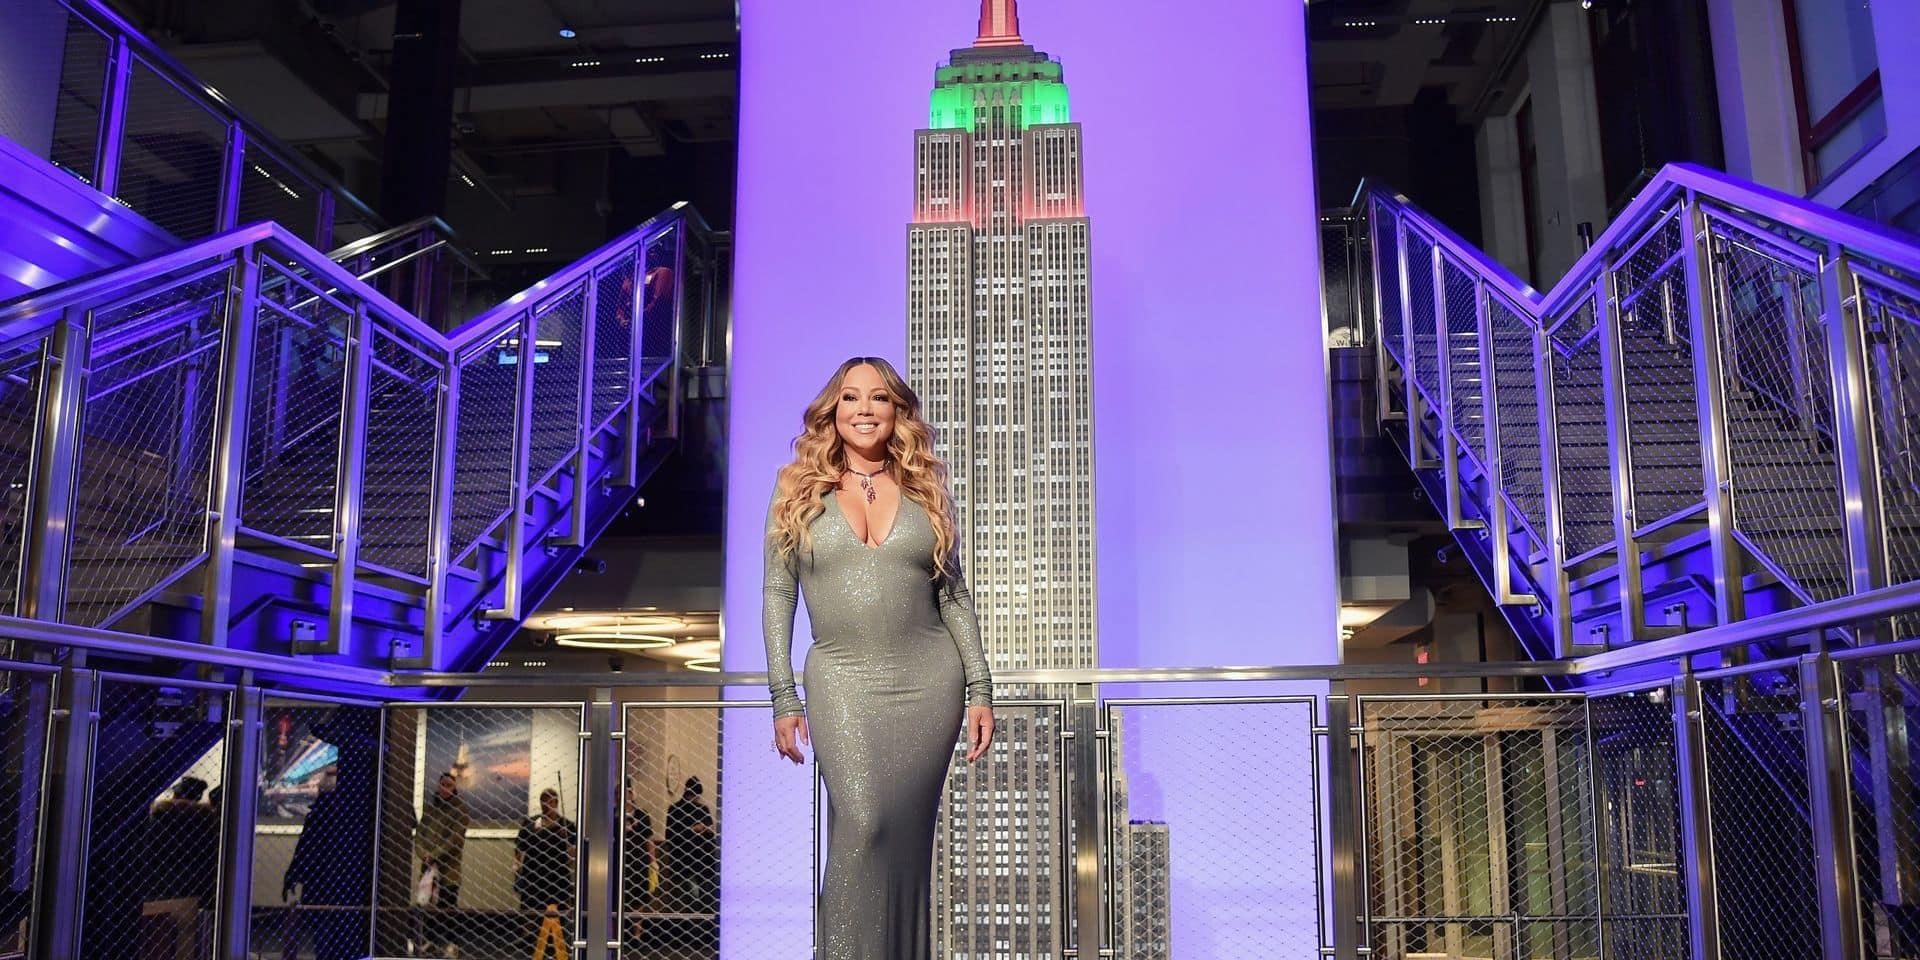 Un téléthon pour New York avec Spike Lee, Mariah Carey et Robert De Niro